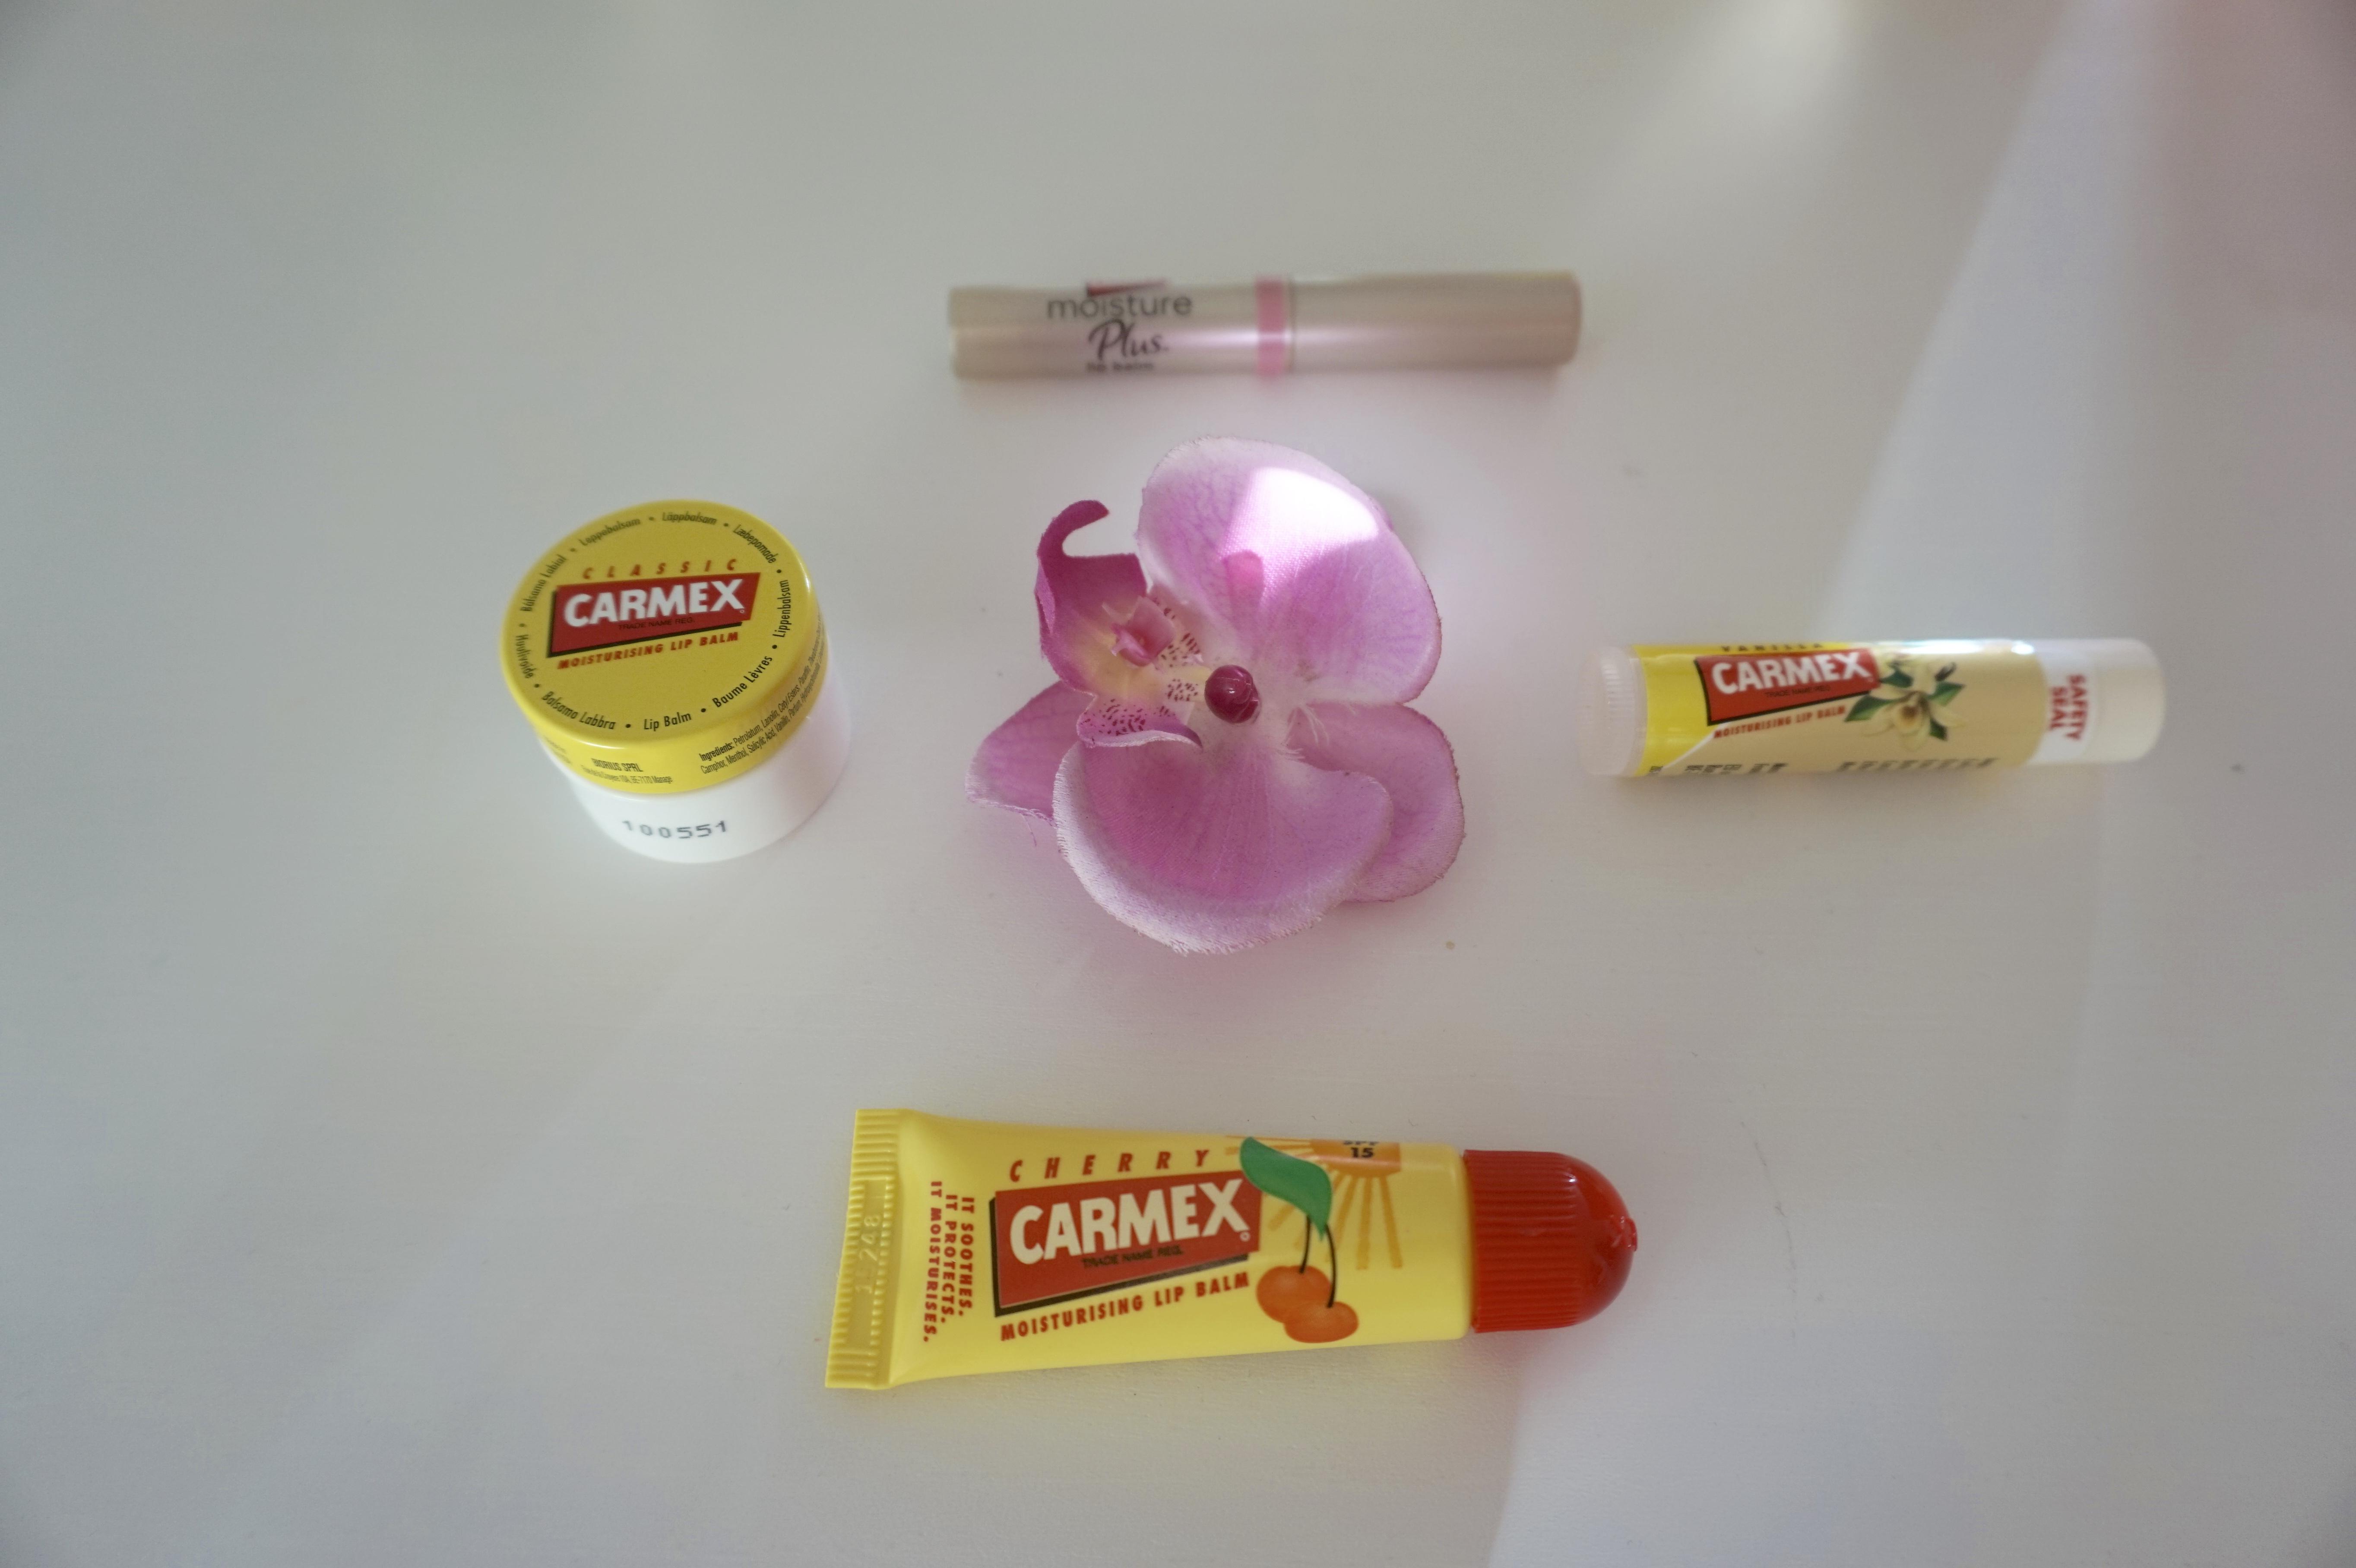 carmex-moisture-plus-lips-xmas-gift-guide